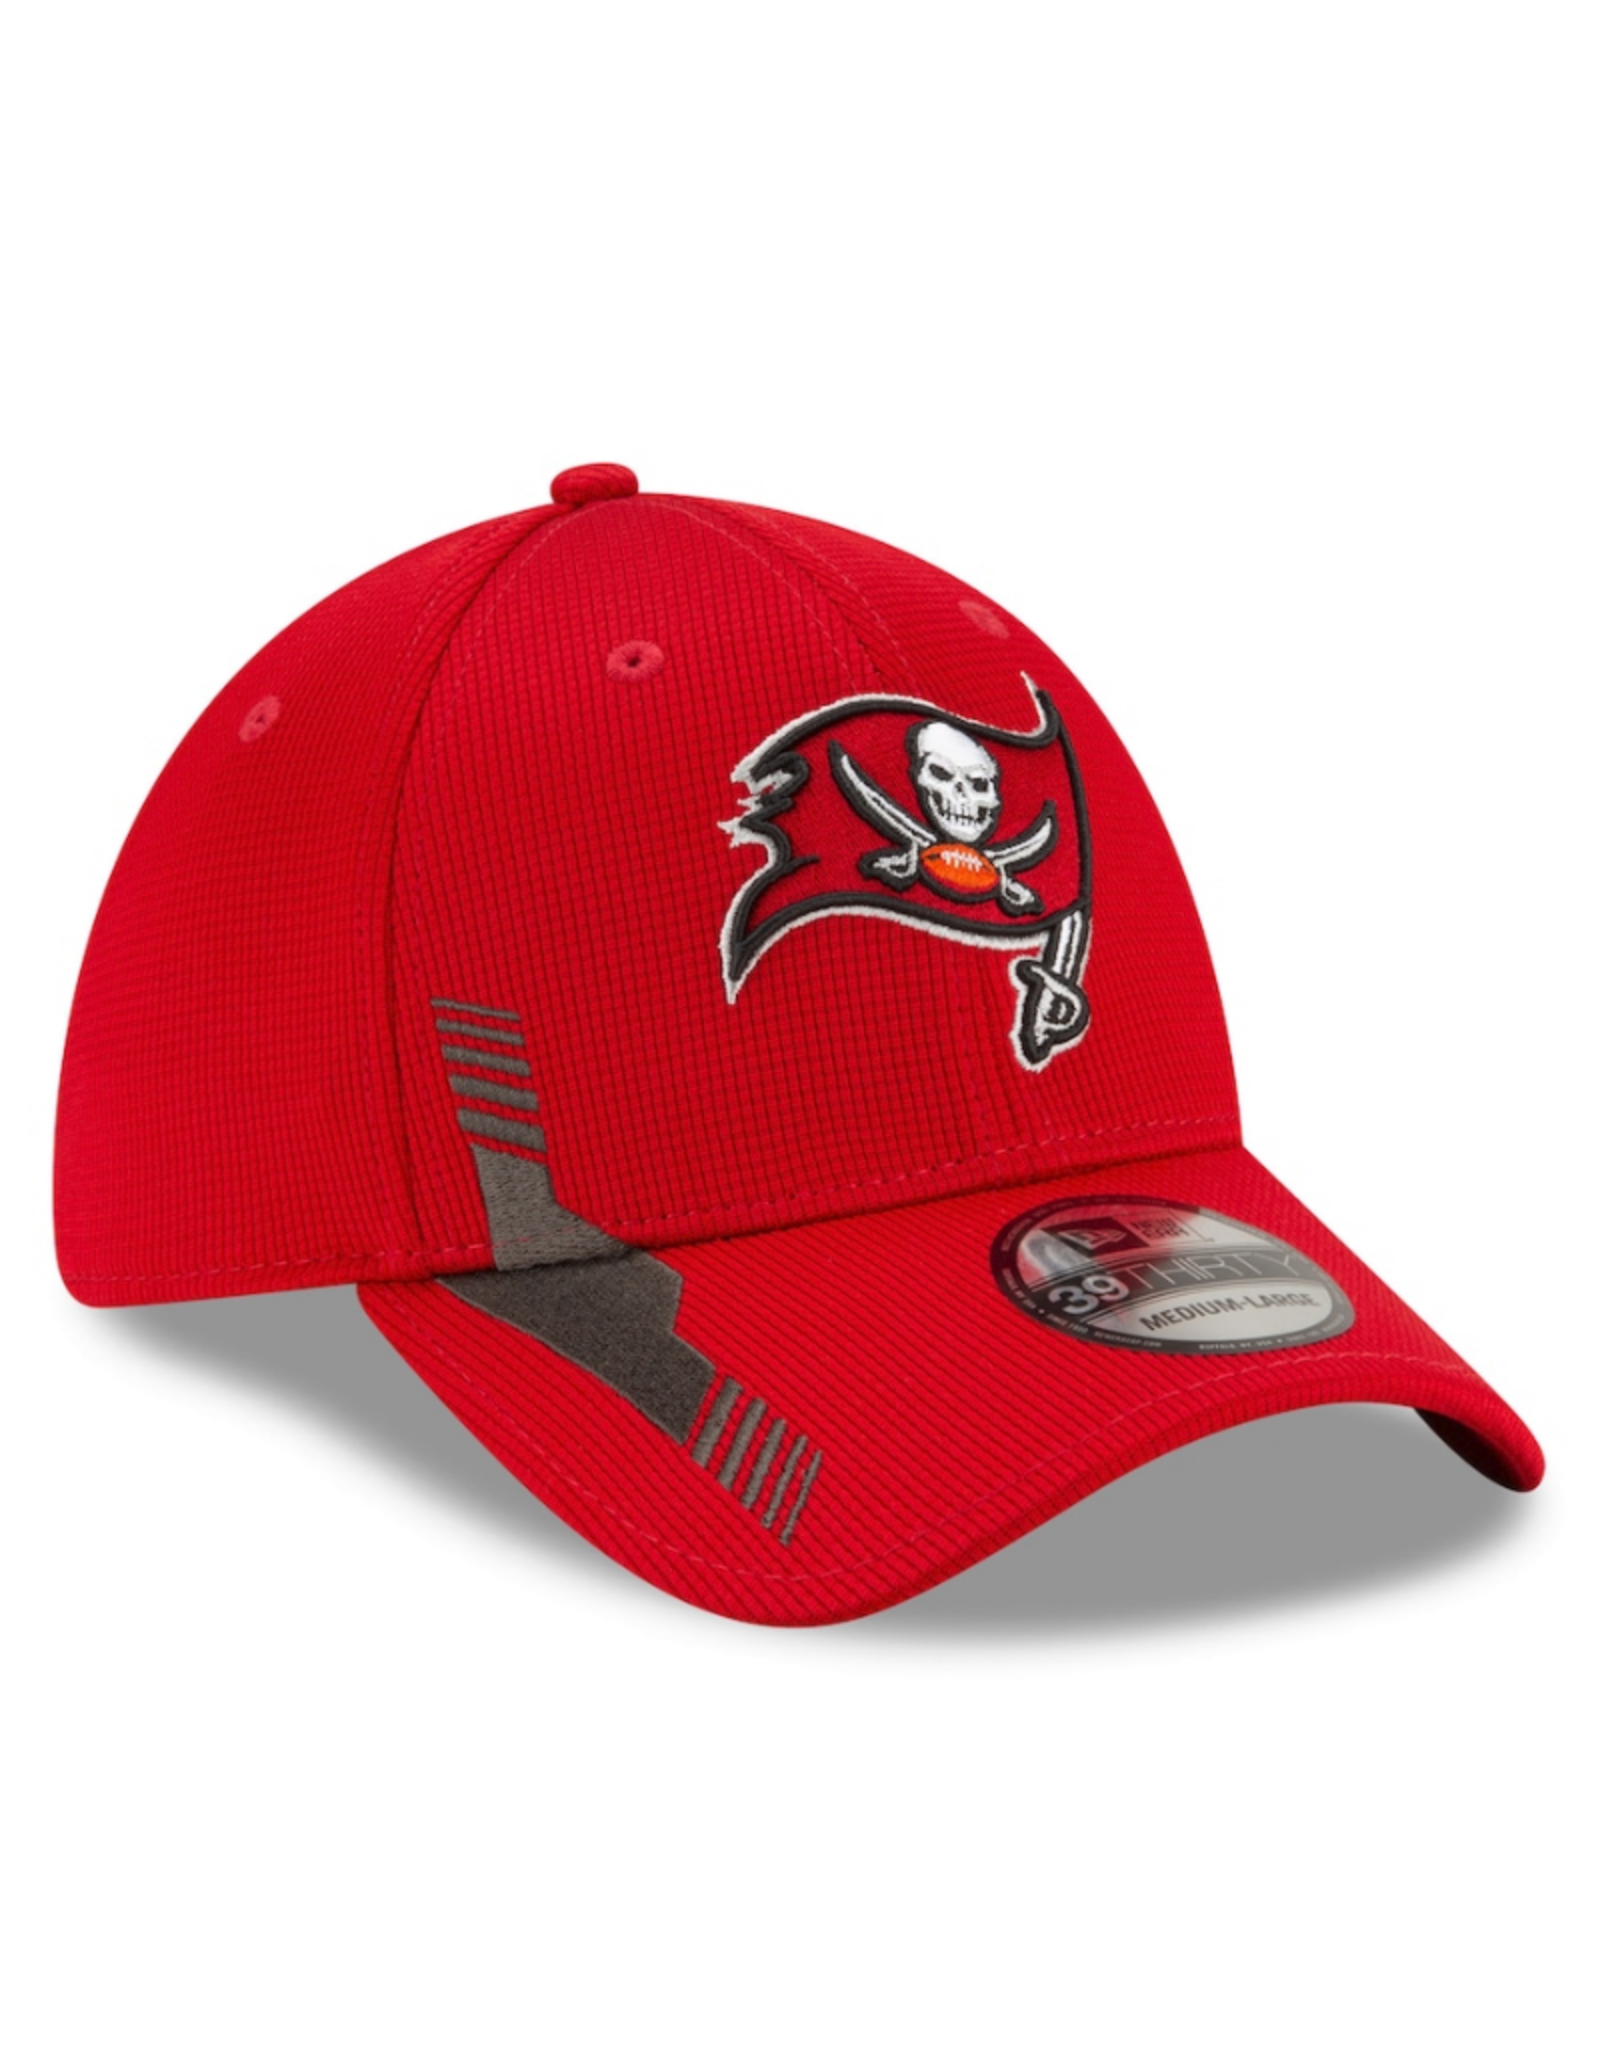 New Era Men's '21 39THIRTY Sideline Home Hat Tampa Bay Buccaneers Burgandy